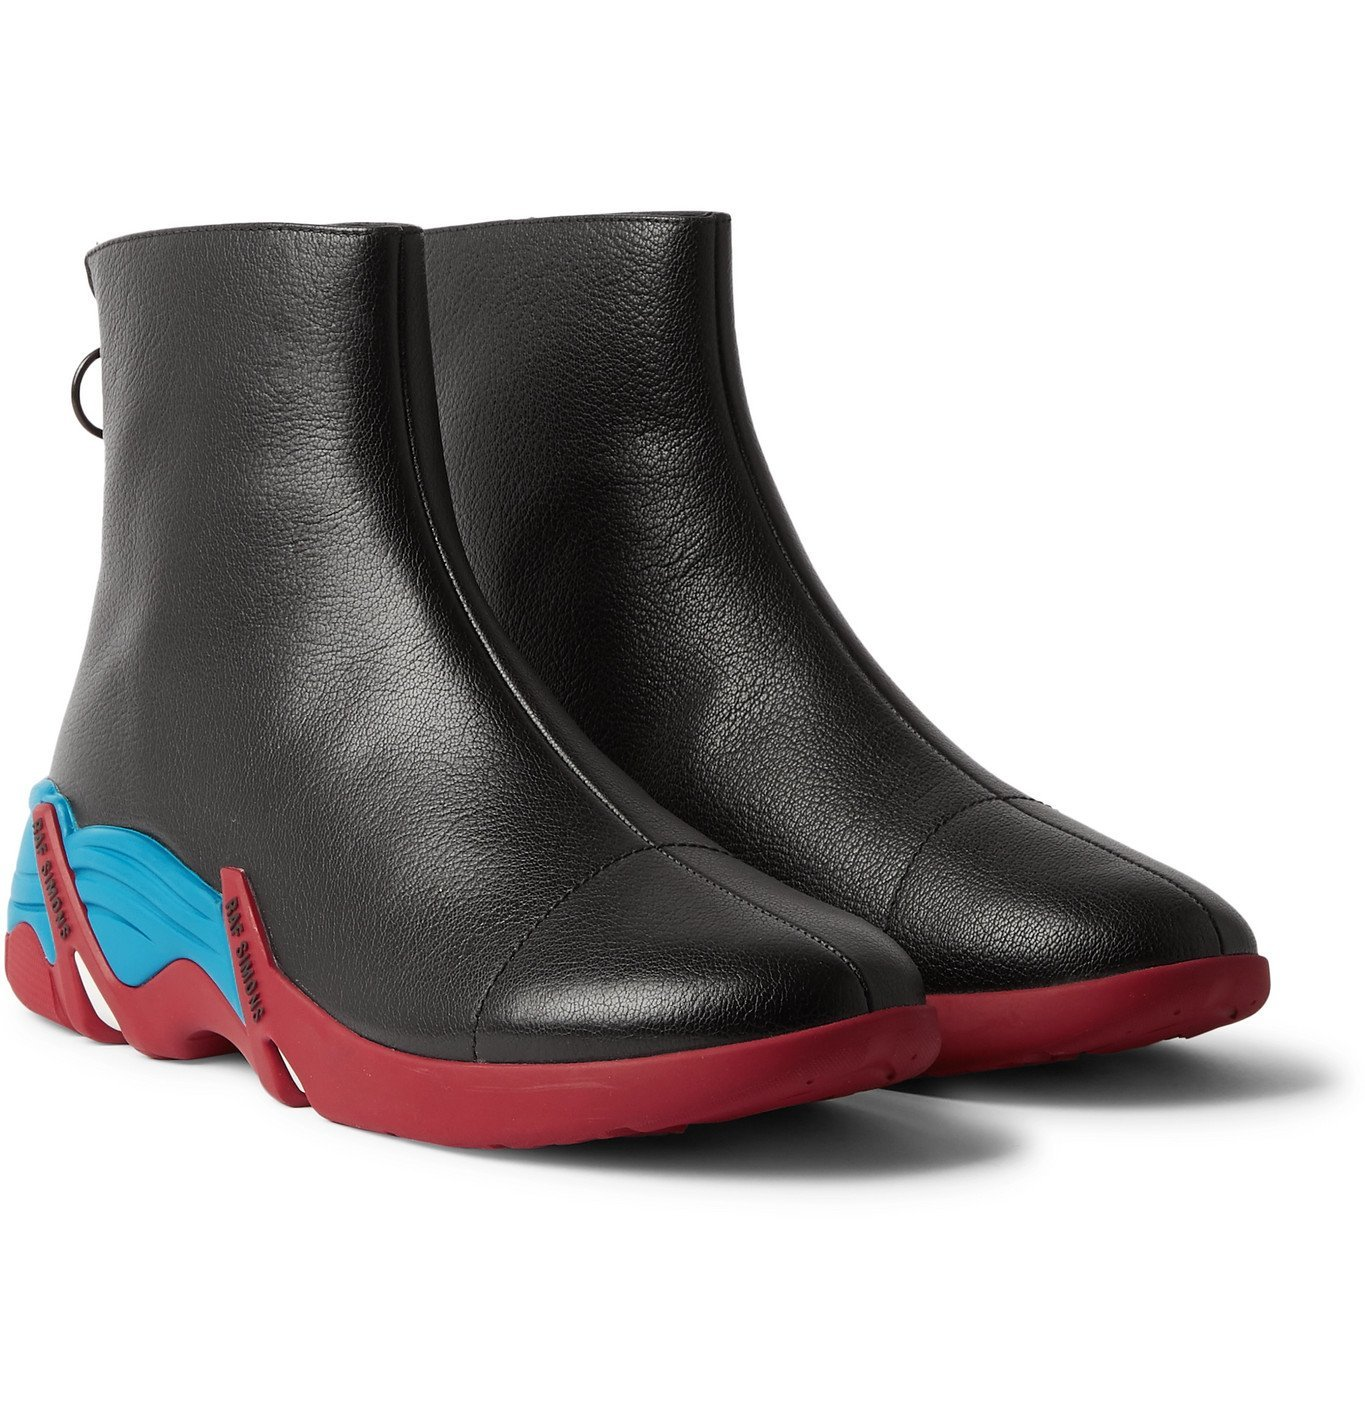 Raf Simons - Cylon Leather Chelsea Boots - Black